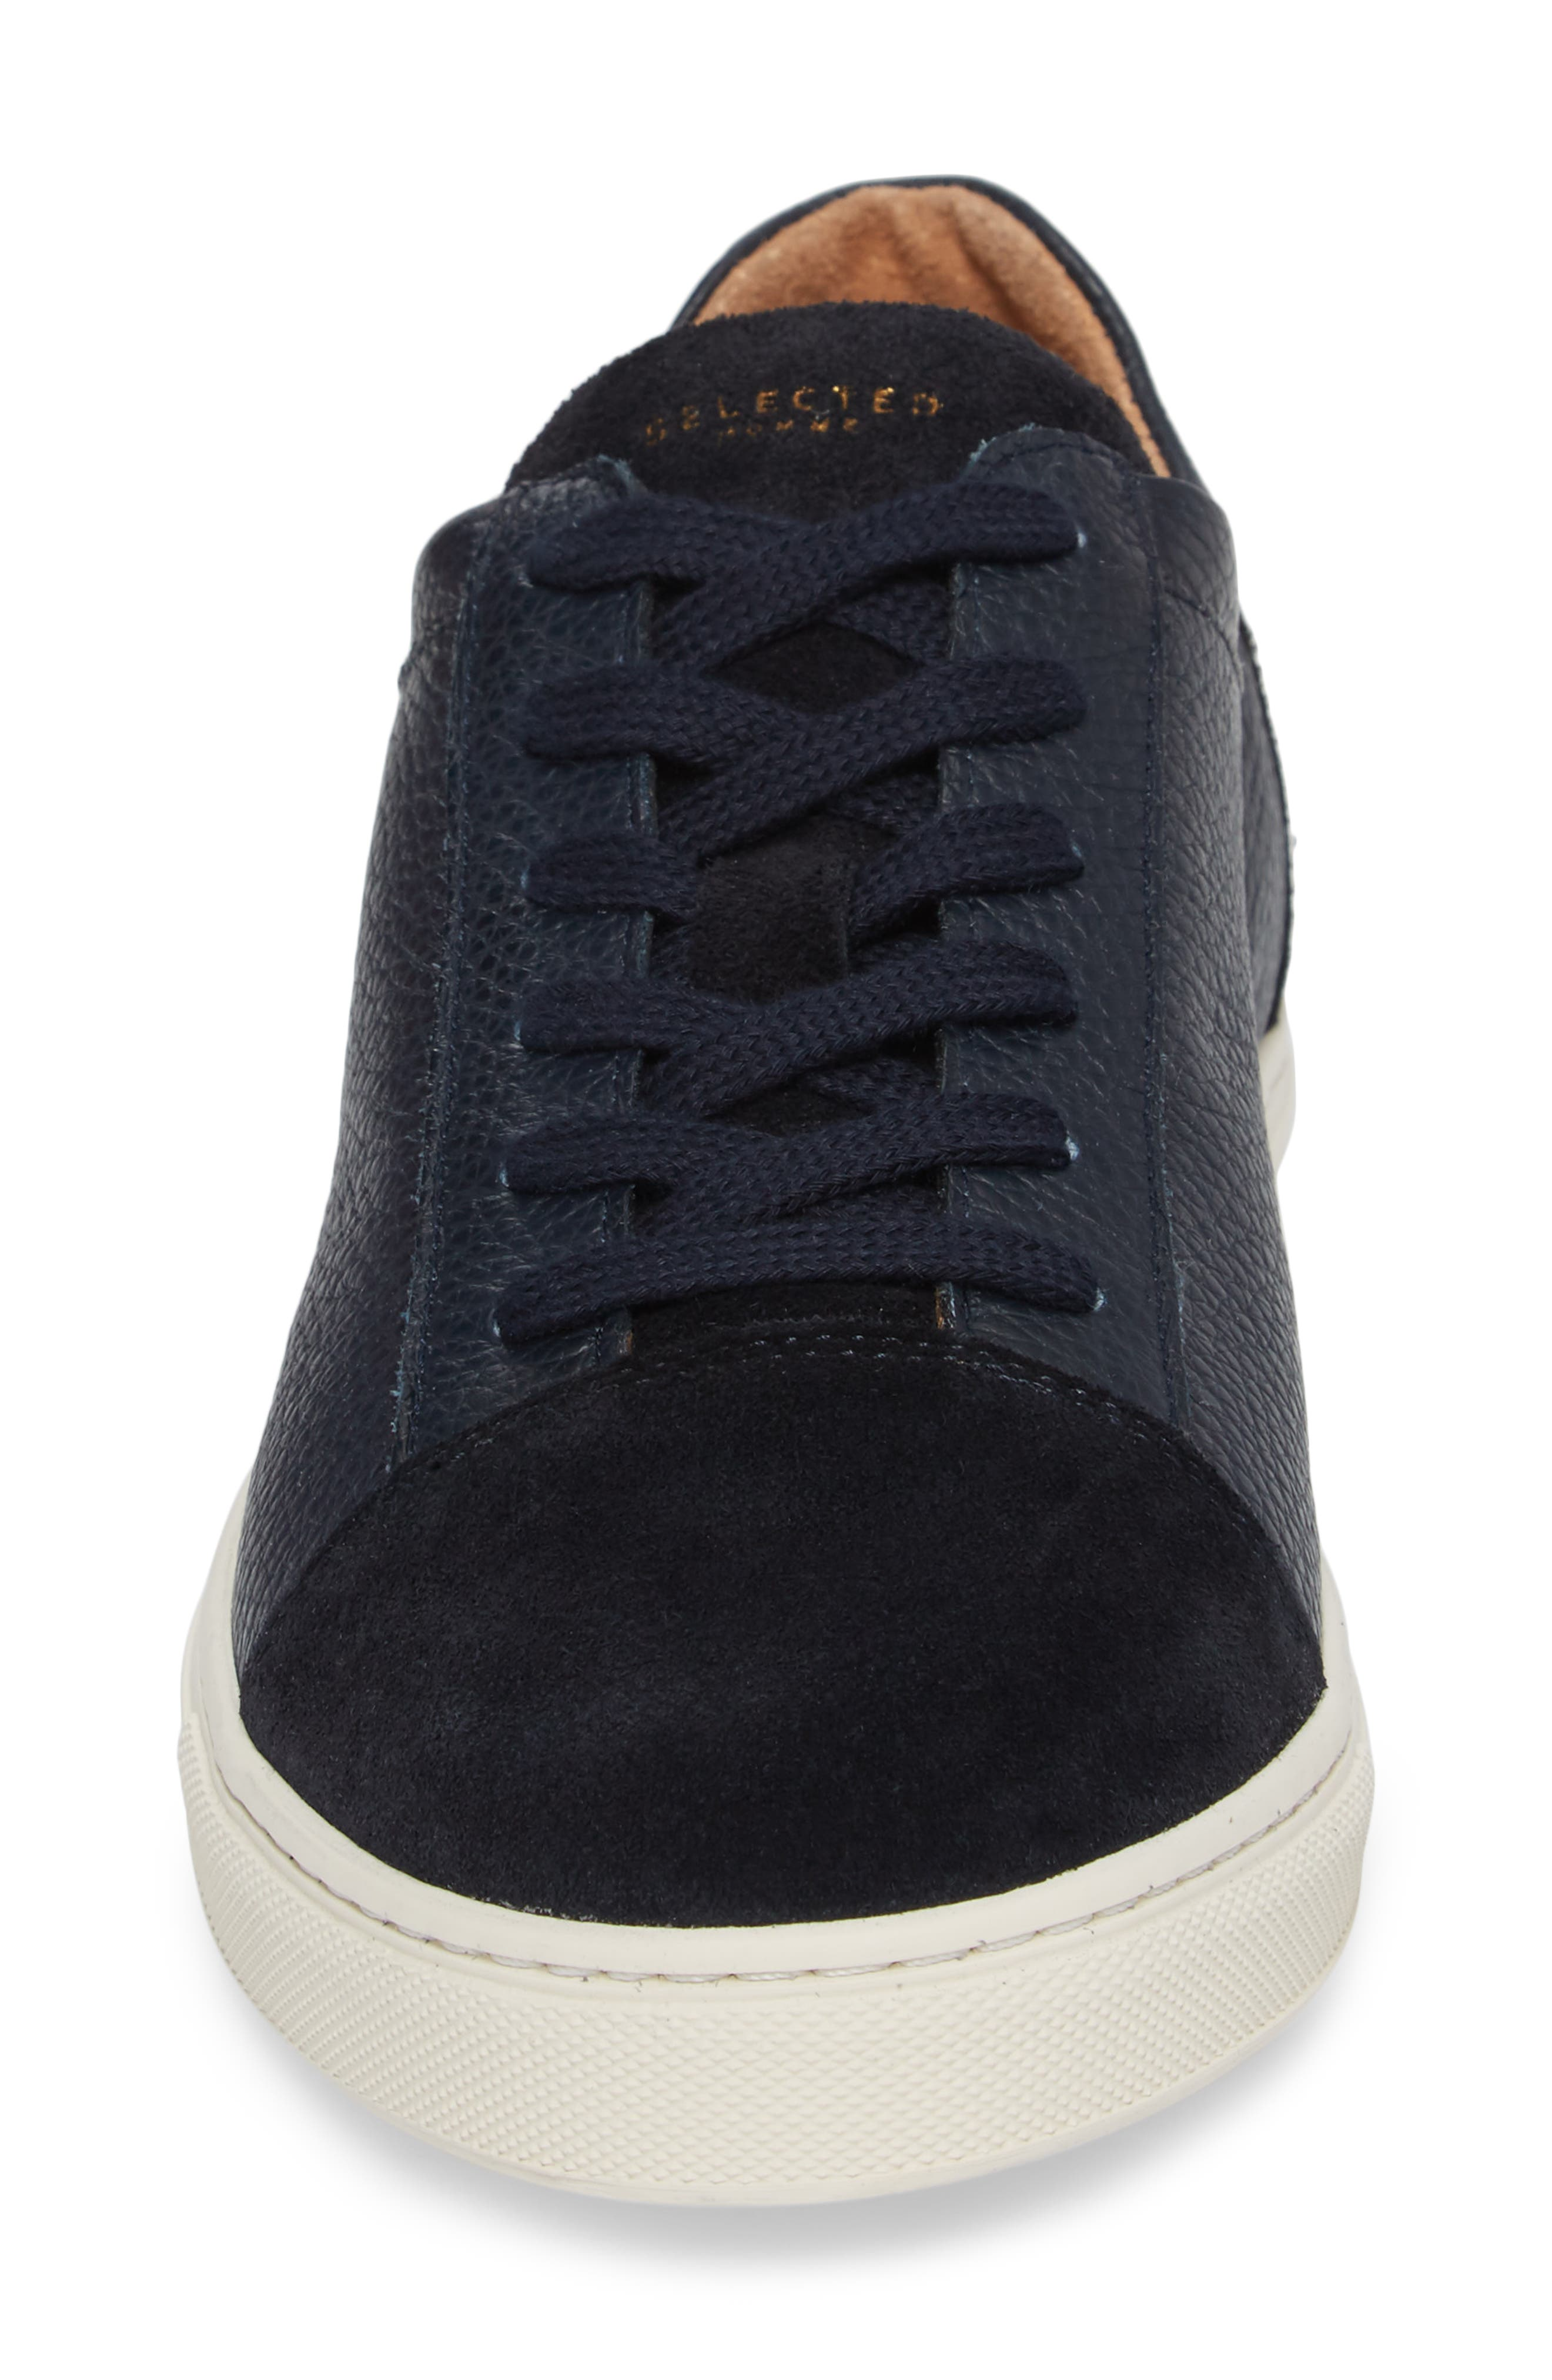 David Cap Toe Sneaker,                             Alternate thumbnail 4, color,                             Dark Navy Leather/ Suede